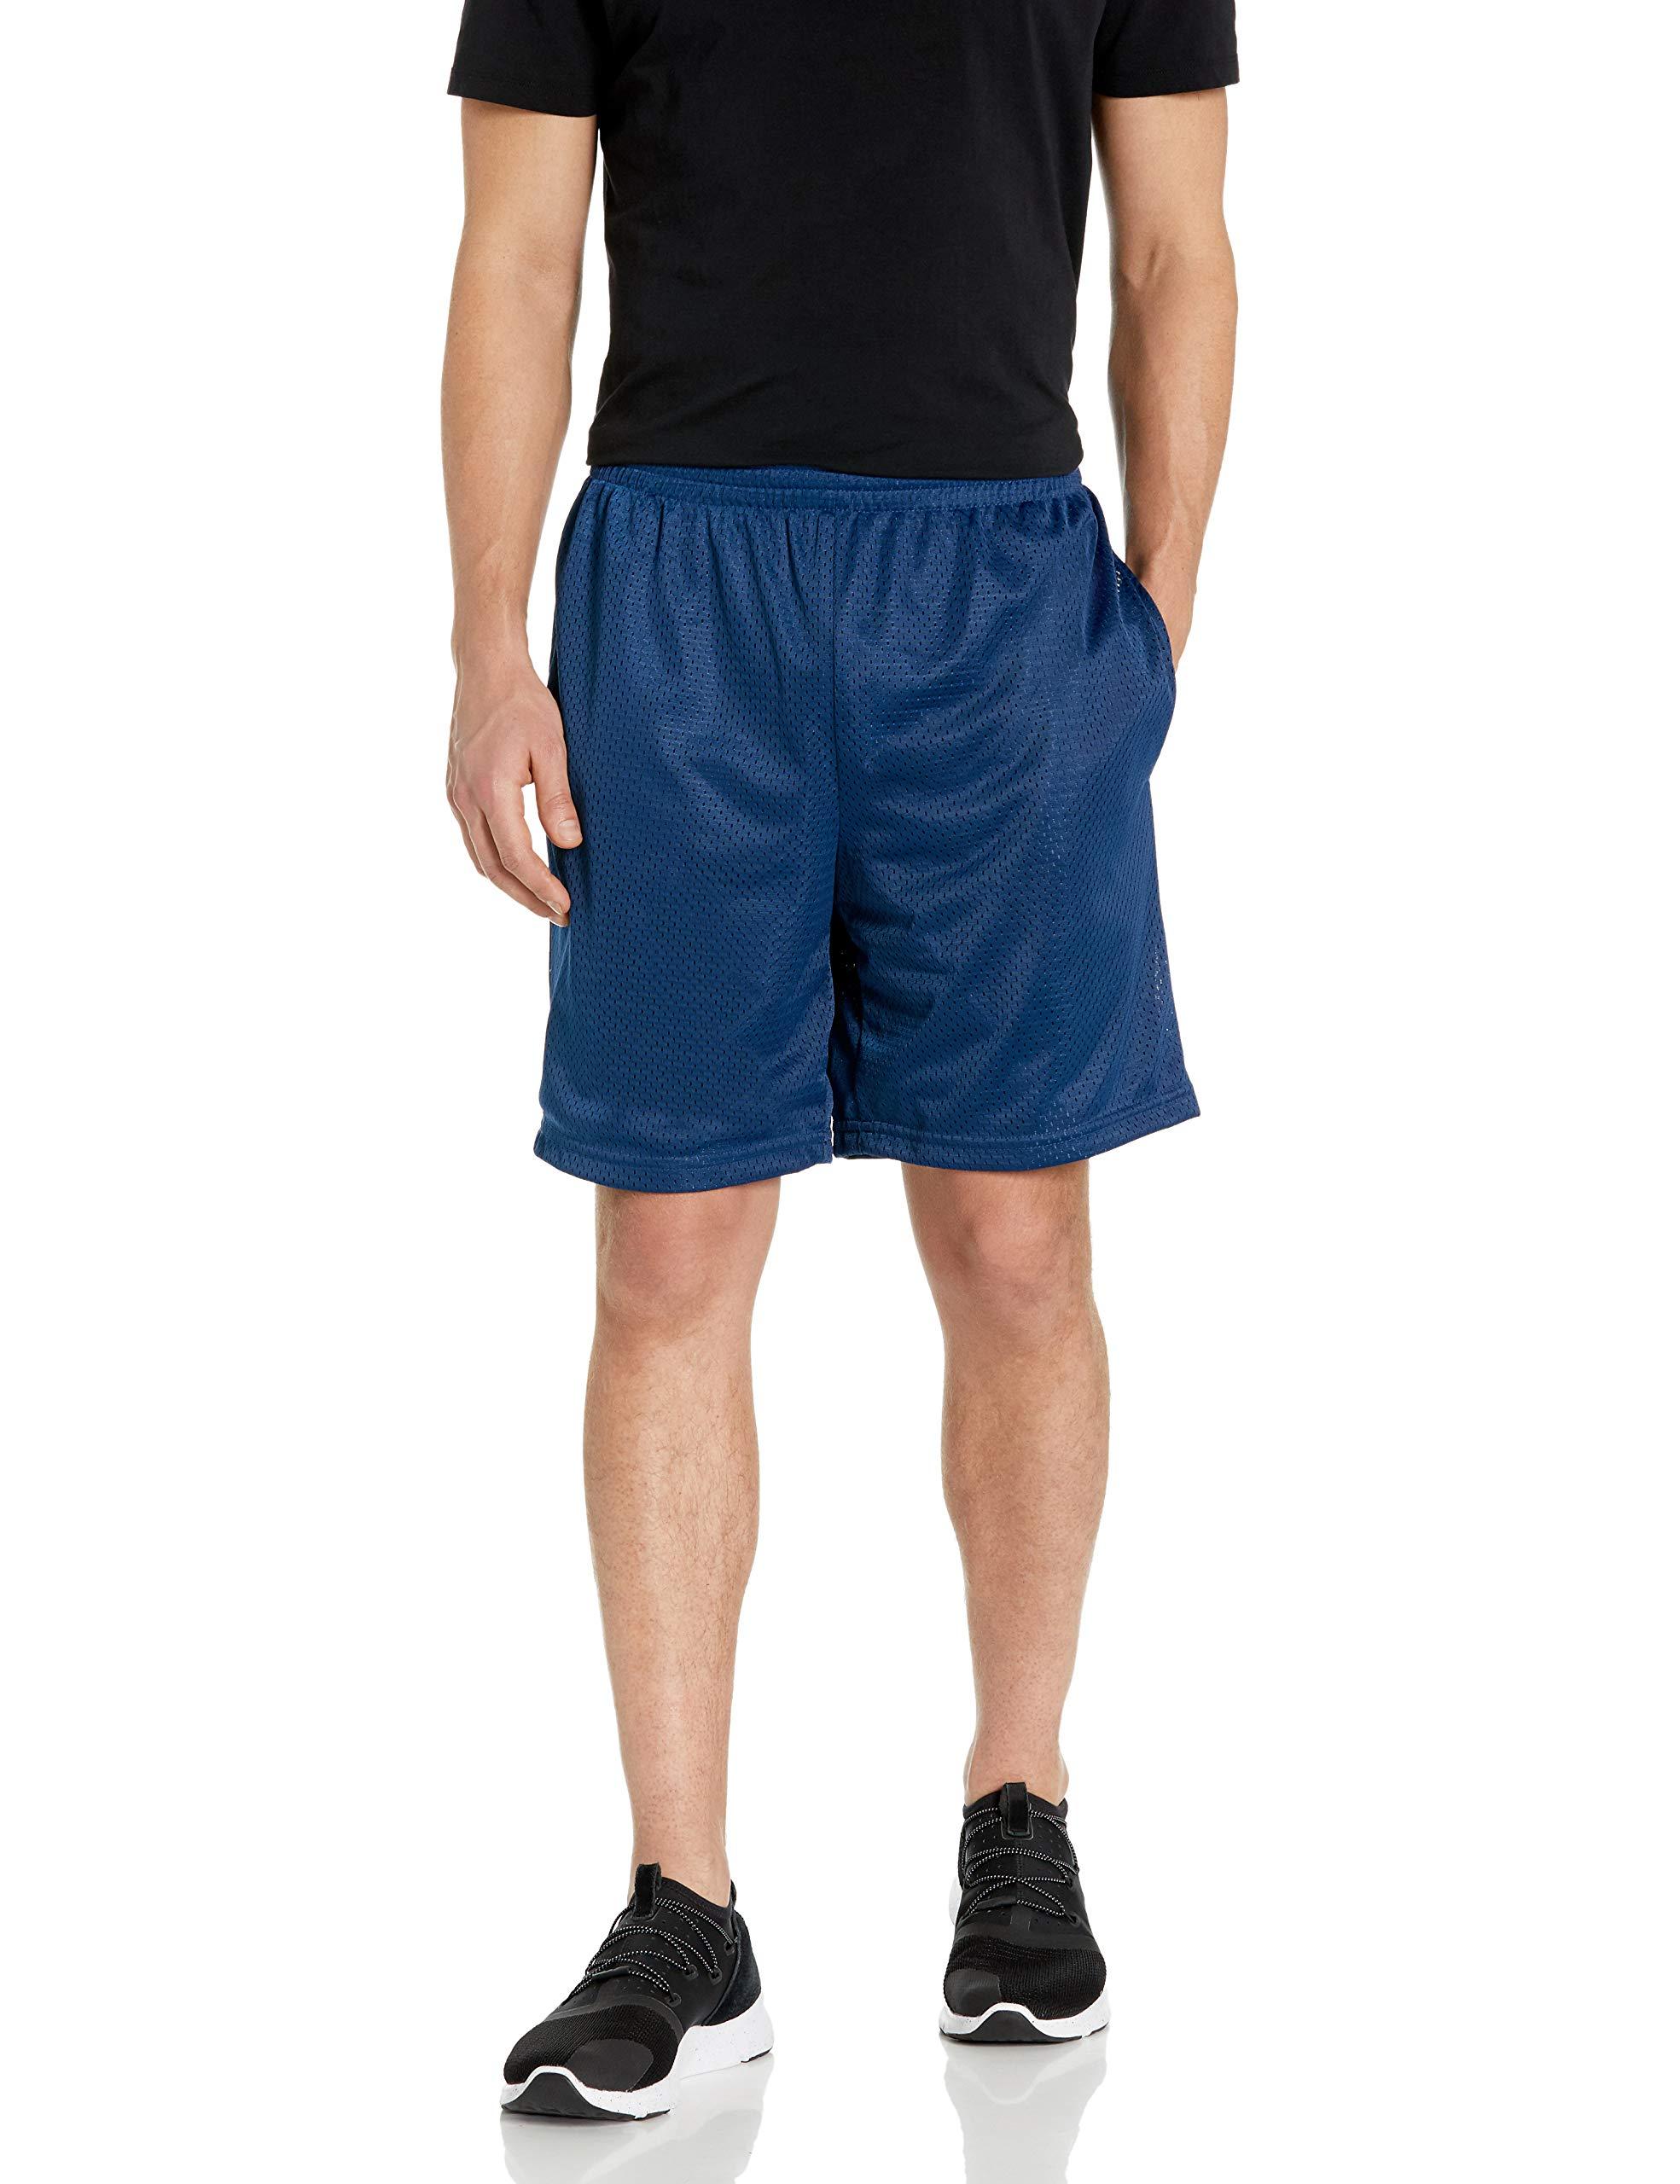 Amazon Essentials Men's Loose-Fit Mesh Basketball Short